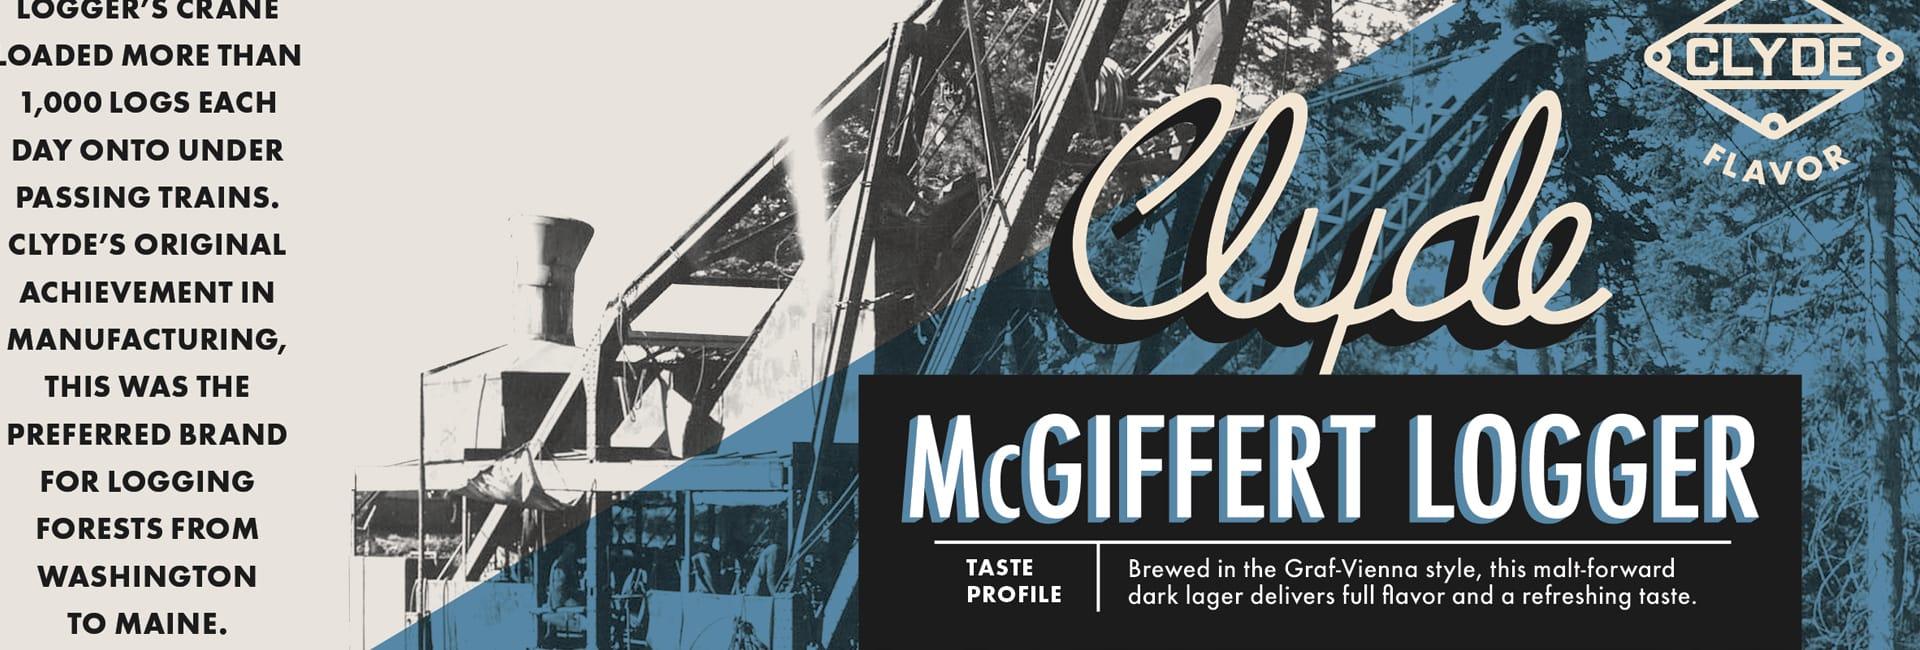 Clyde Iron Works McGiffert Logger